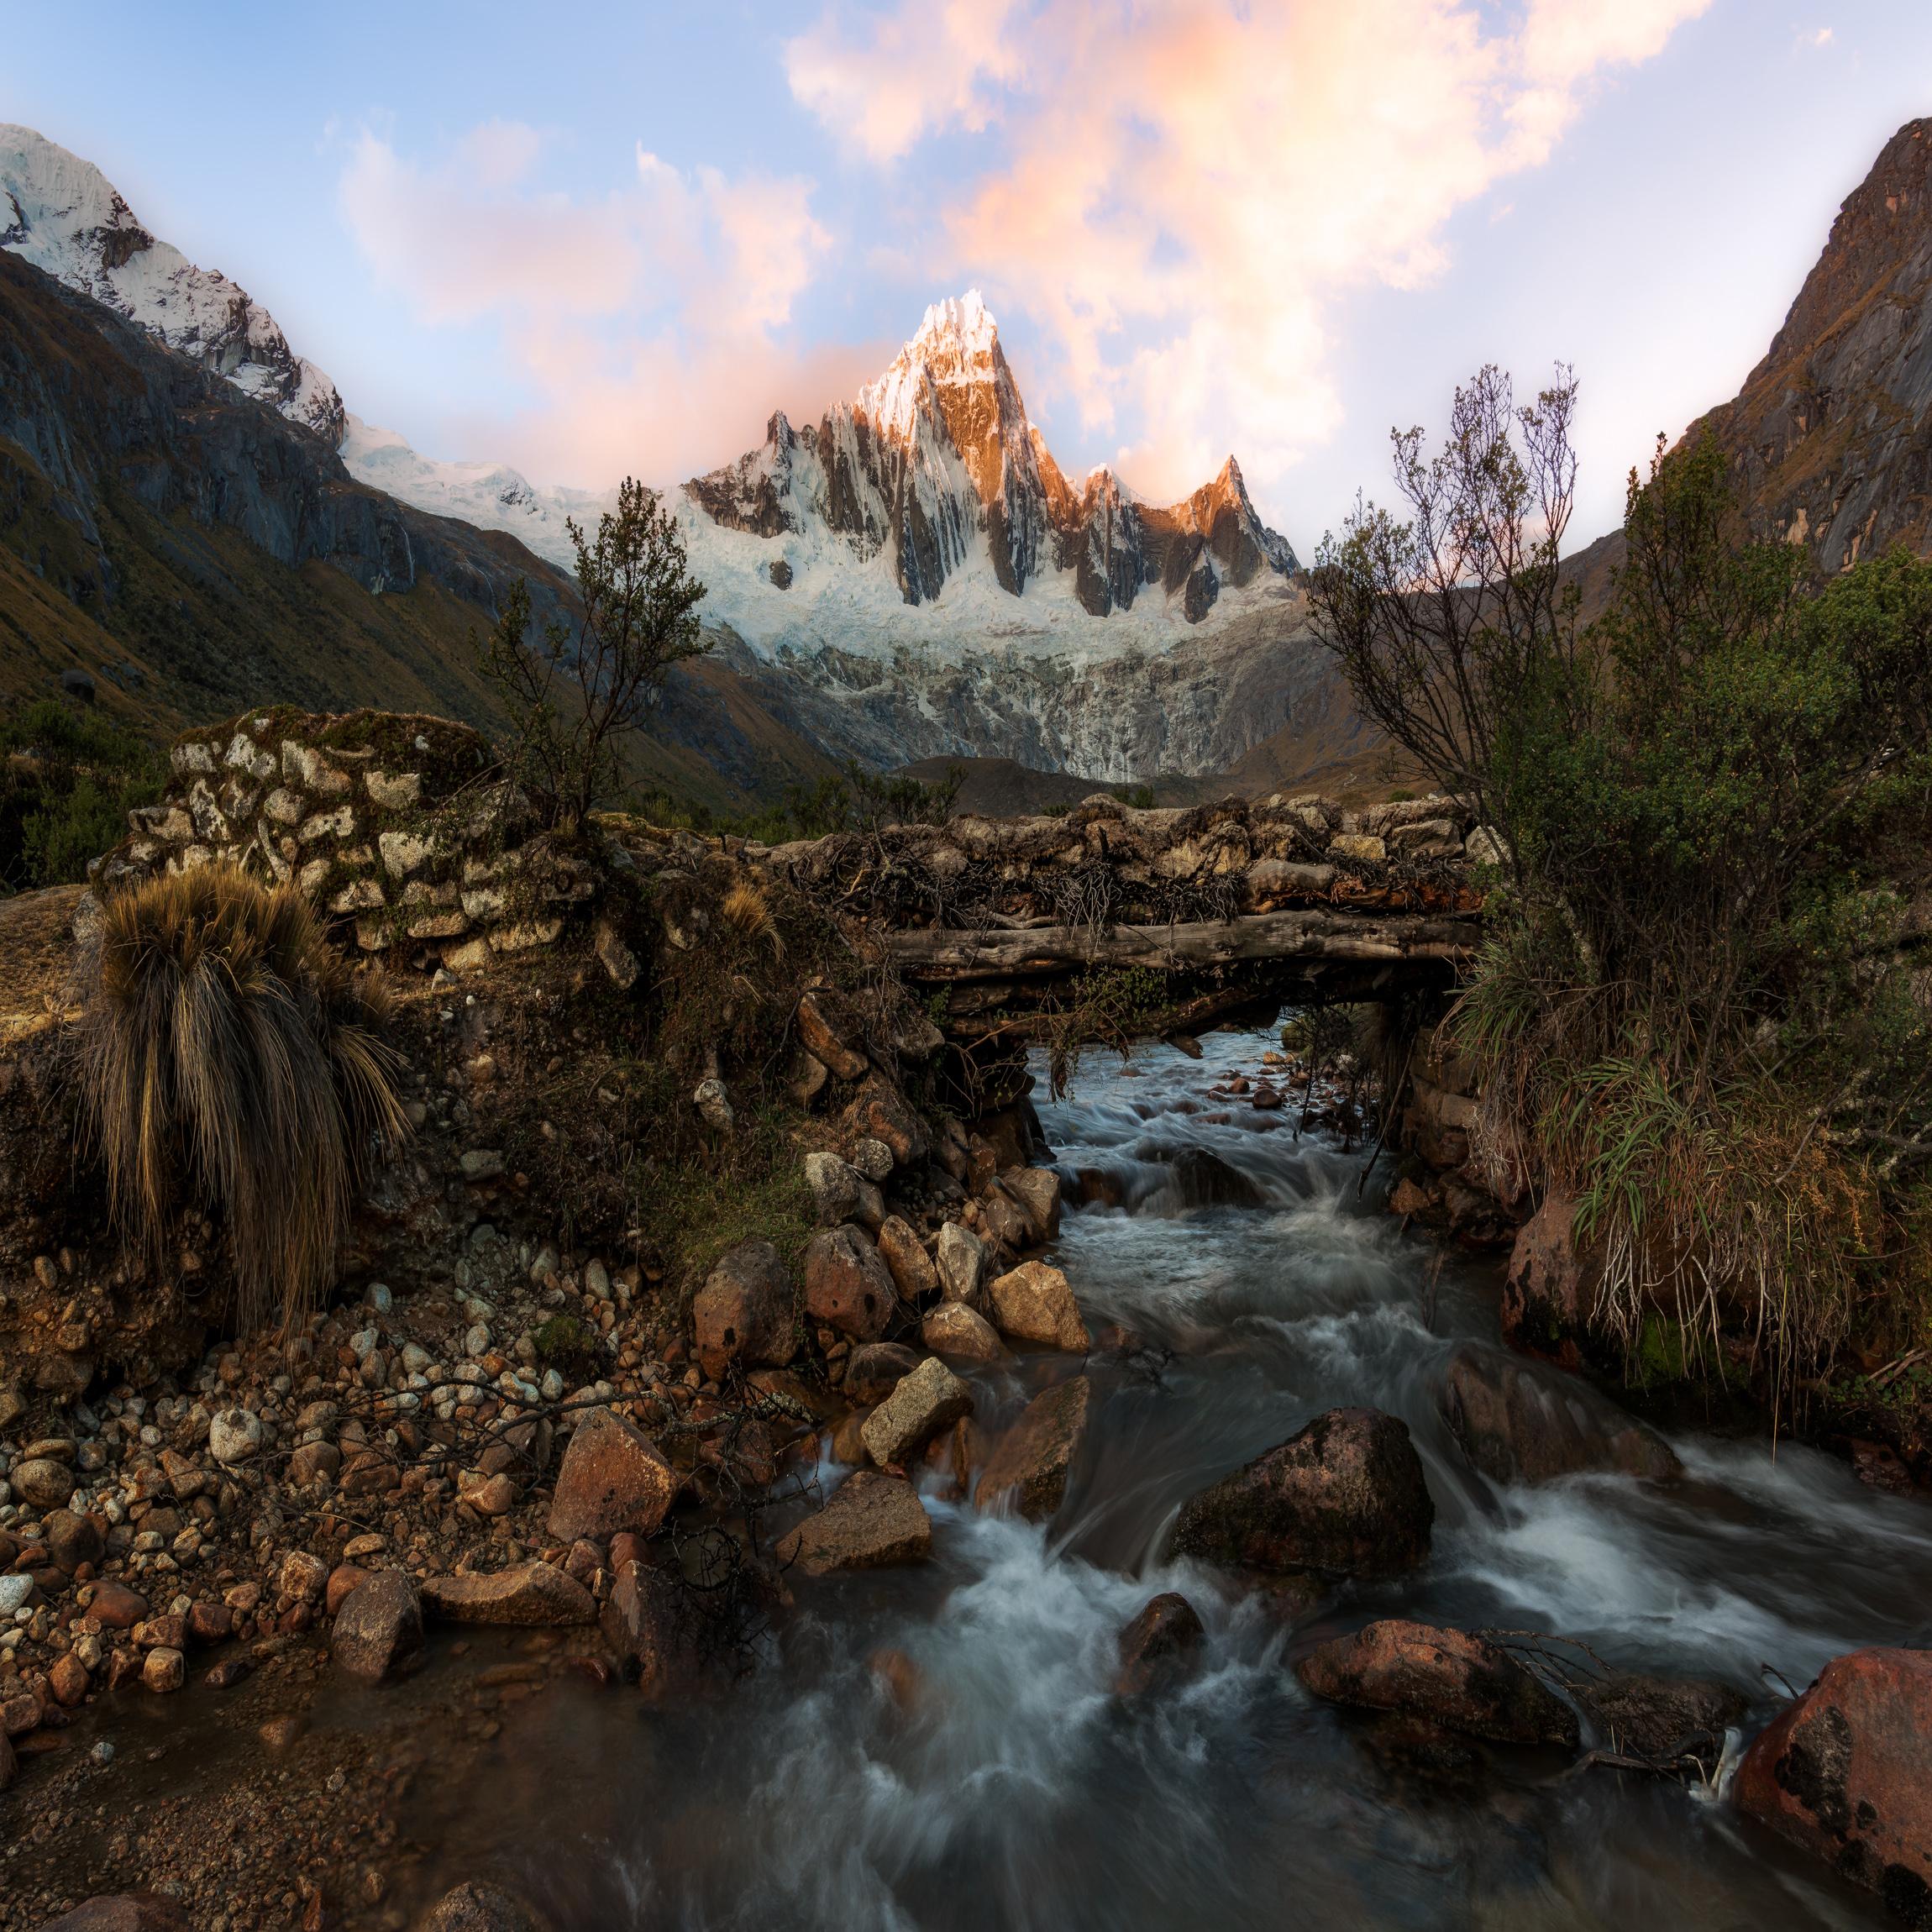 1st Place Sunrise/Sunset Category -Taulliraju on the Santa Cruz Trek (Huaraz, Peru)